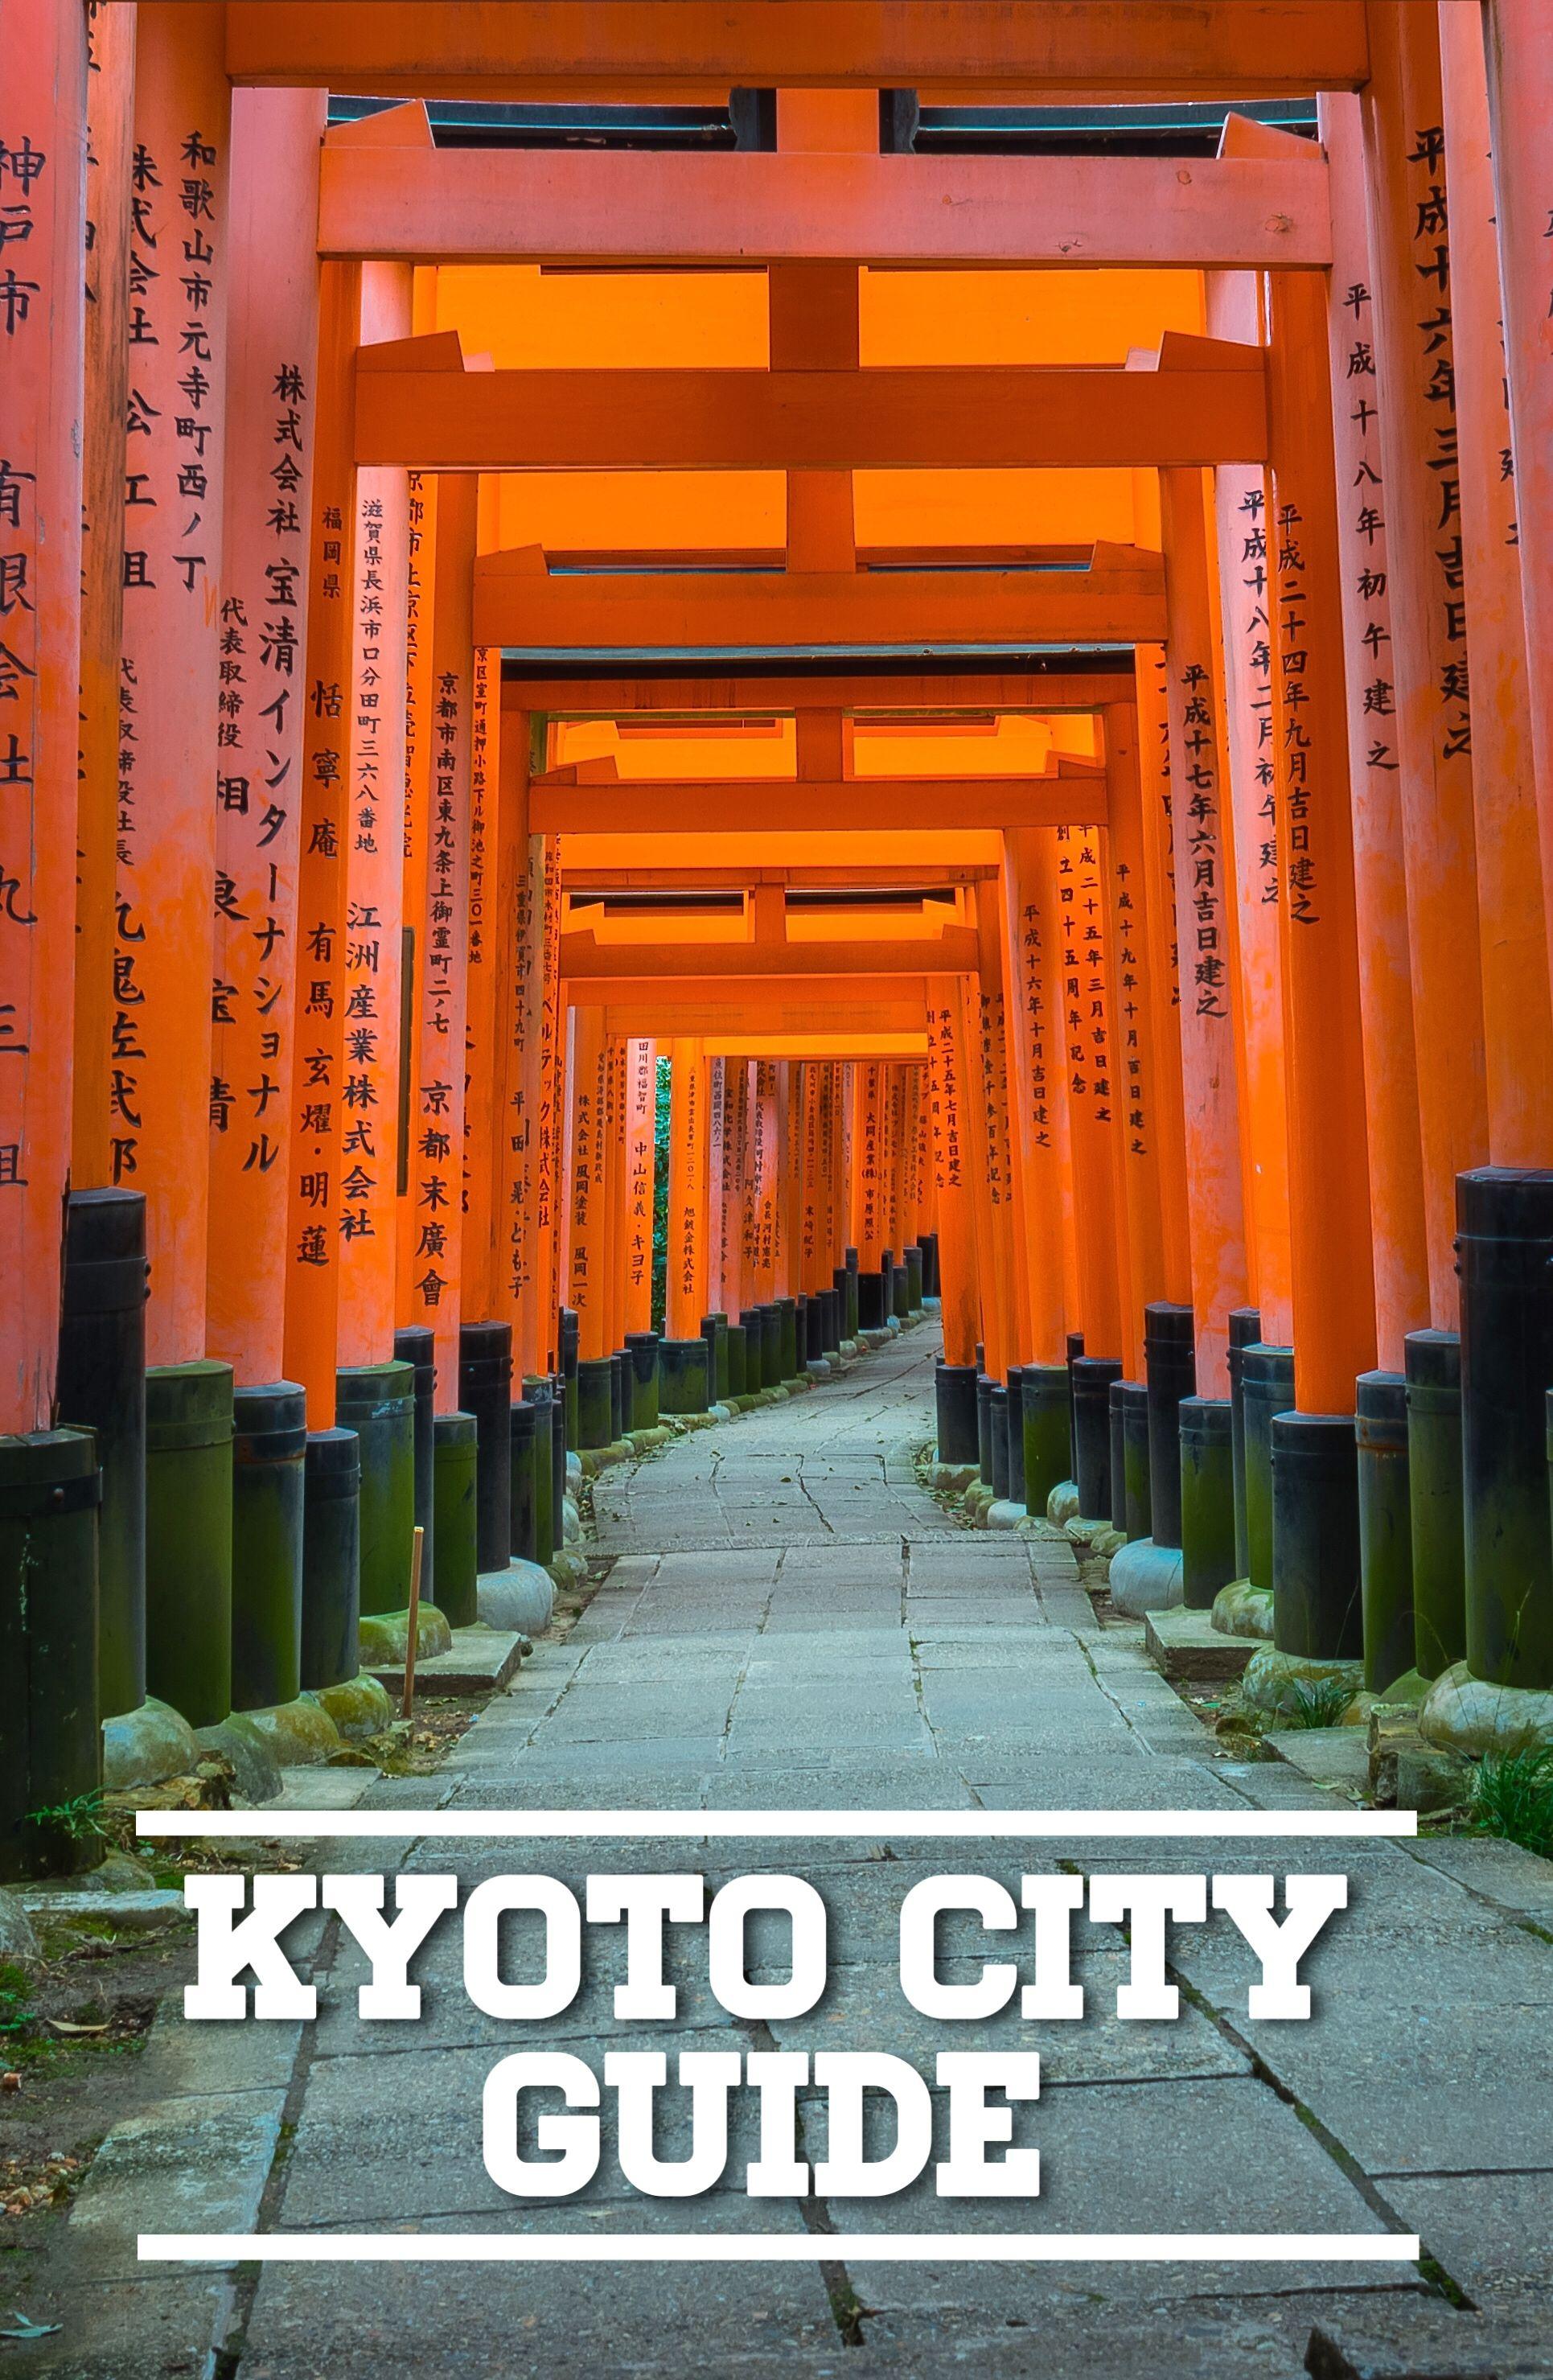 Kyoto City Guide Japan Travel Kyoto Travel Kyoto Travel Guide